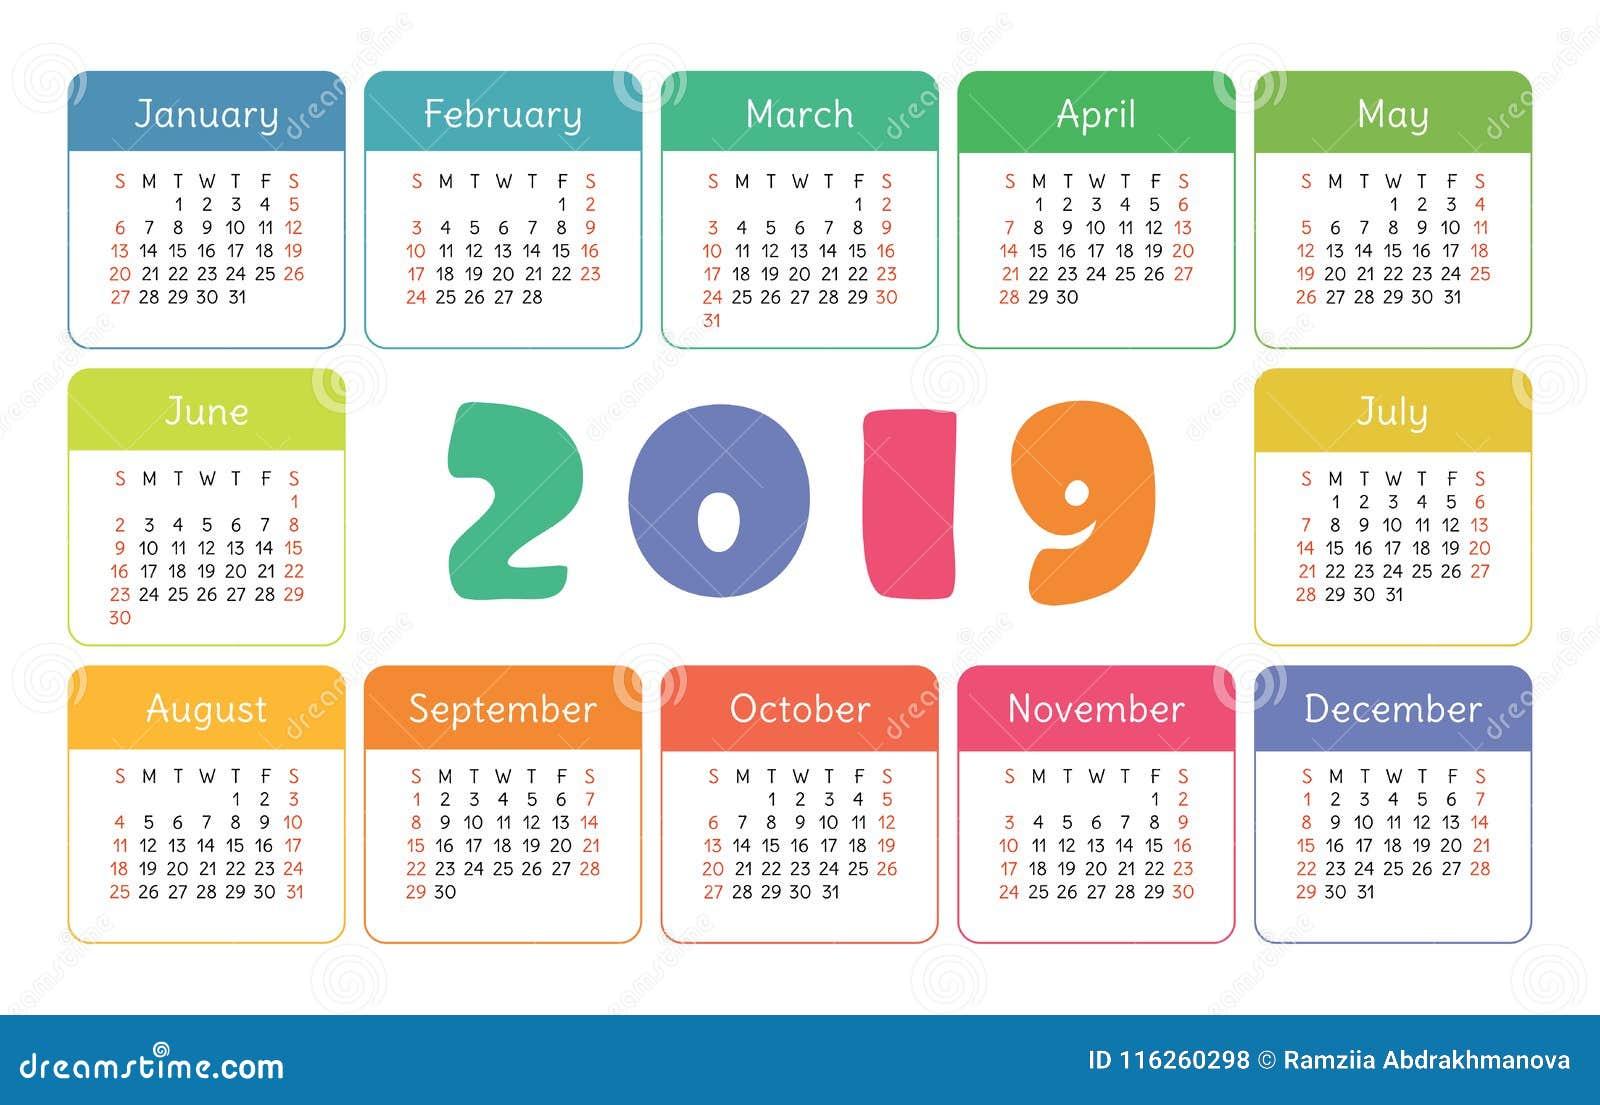 pocket calendar 2019 basic simple template week starts on sunday